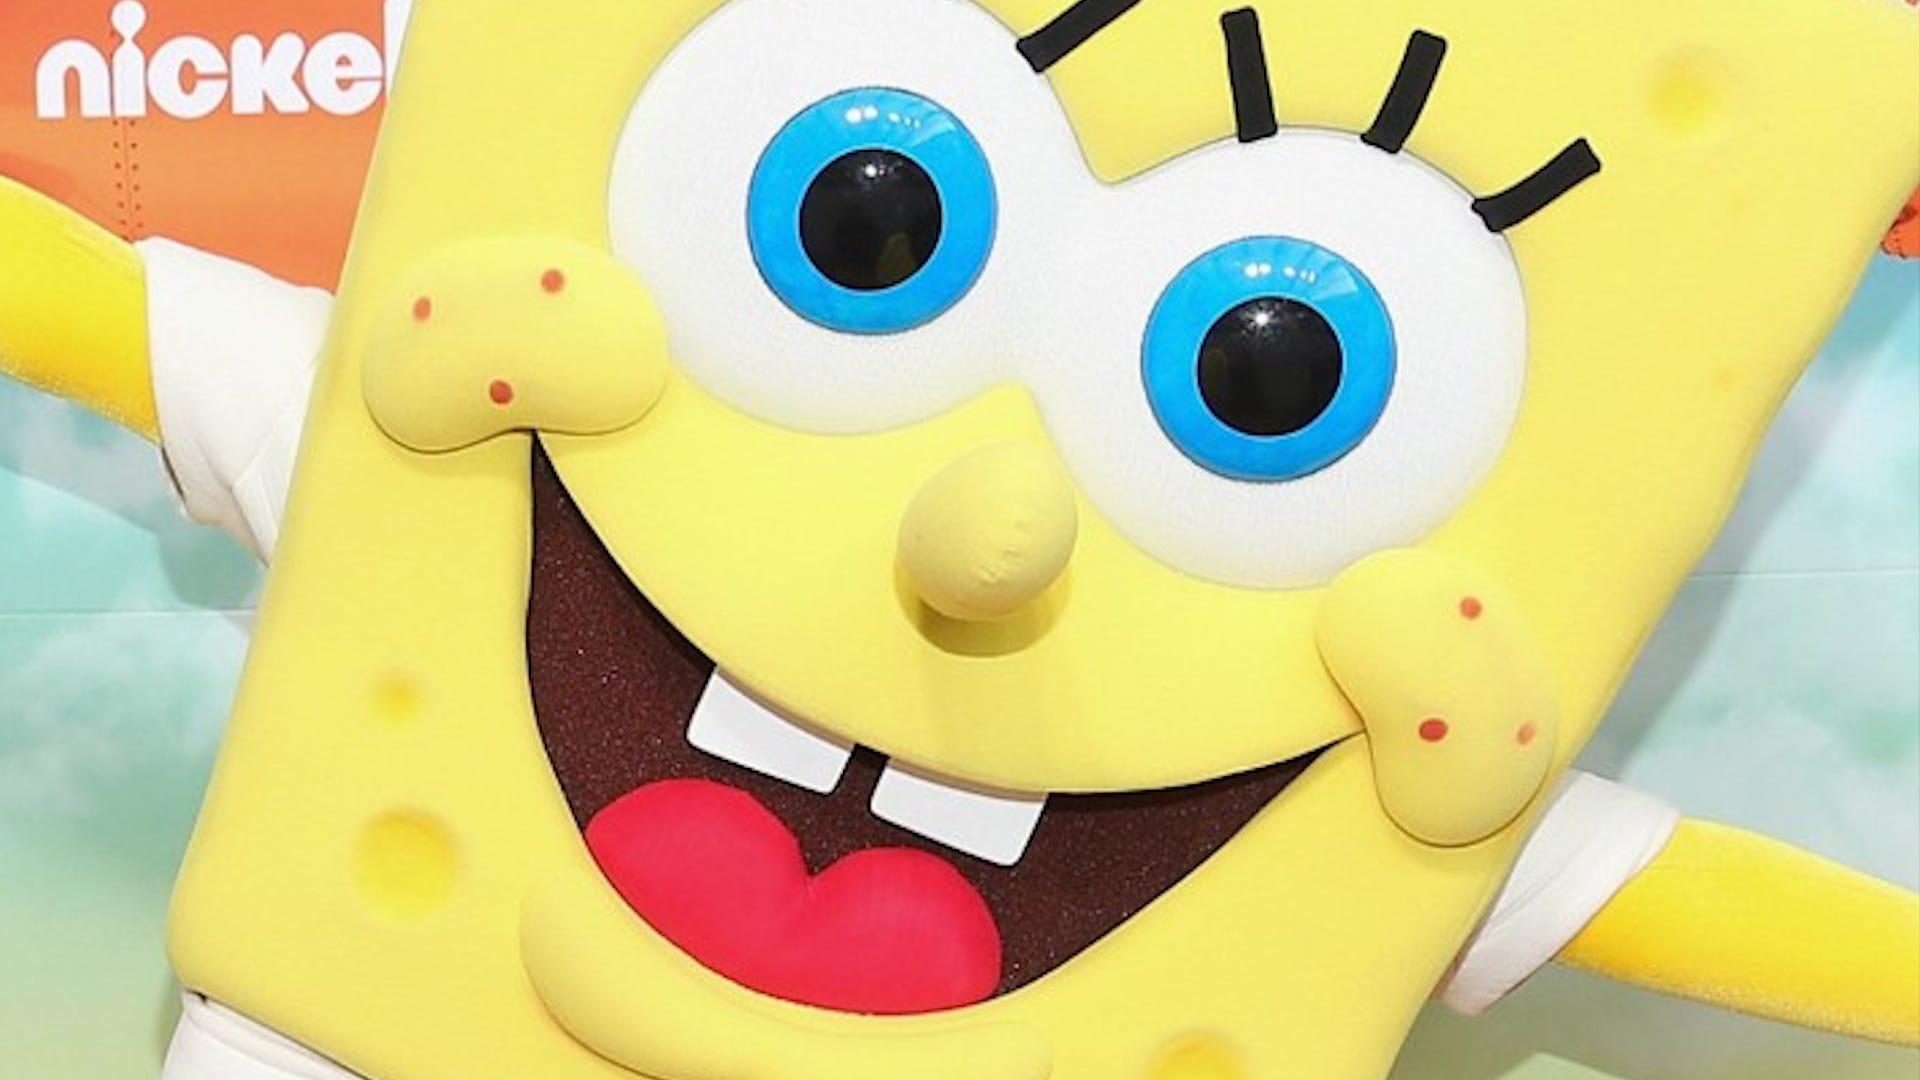 'SpongeBob SquarePants' turns 20